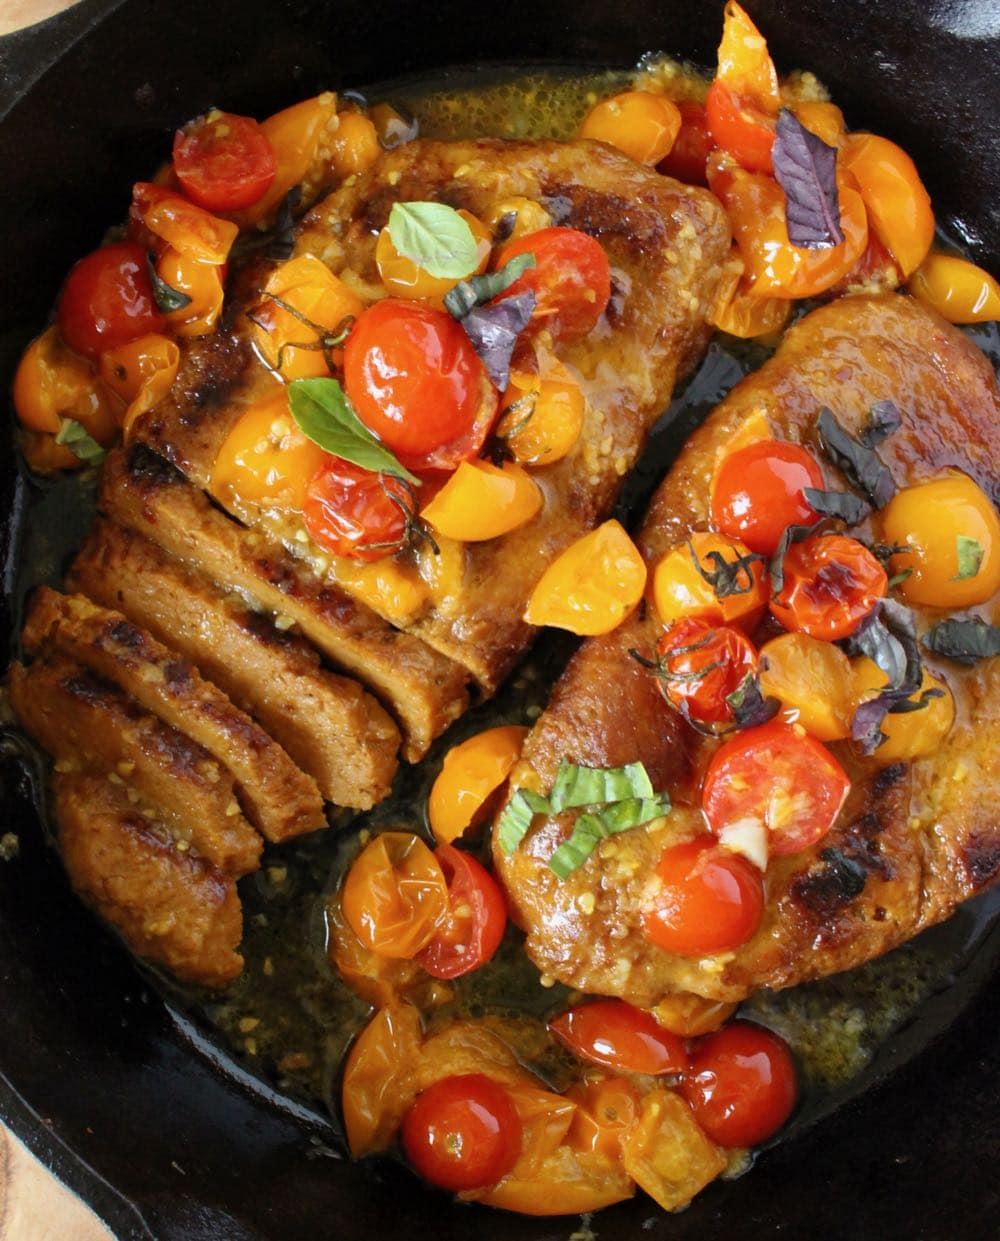 Vegan steak recipe with cherry tomato sauce